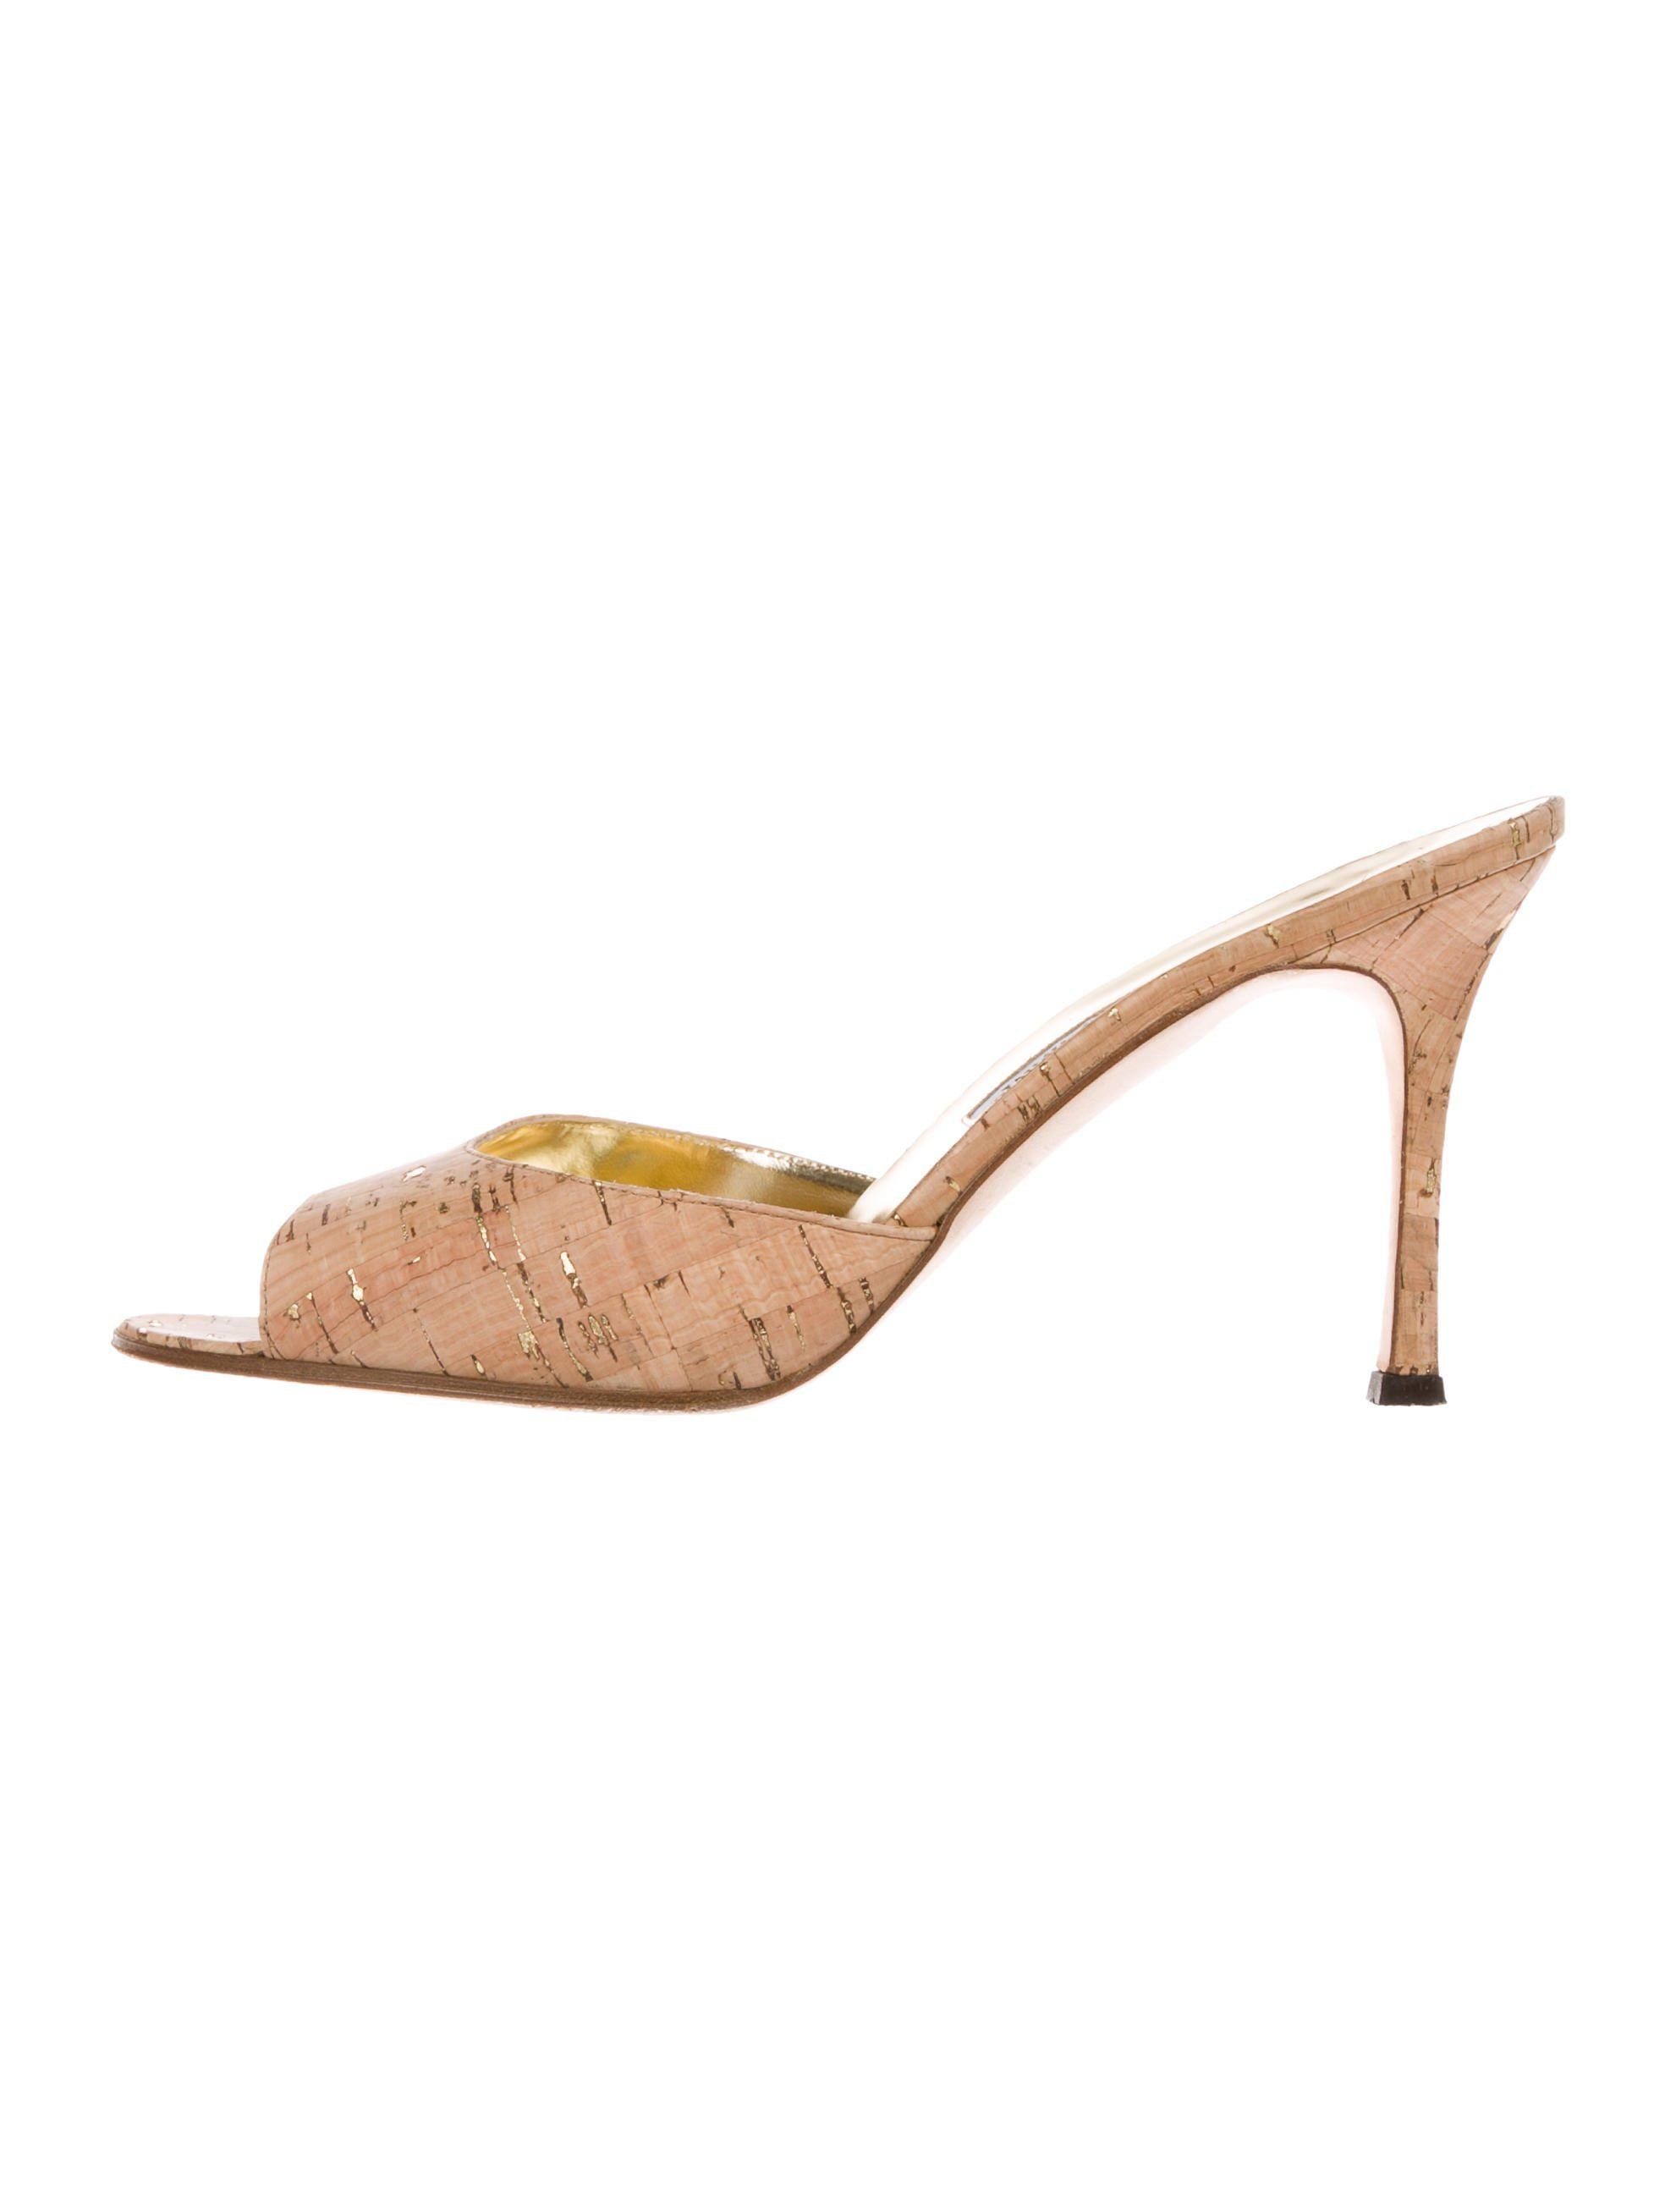 562403d2544 Lyst - Manolo Blahnik Astuta Cork Sandals Tan in Metallic